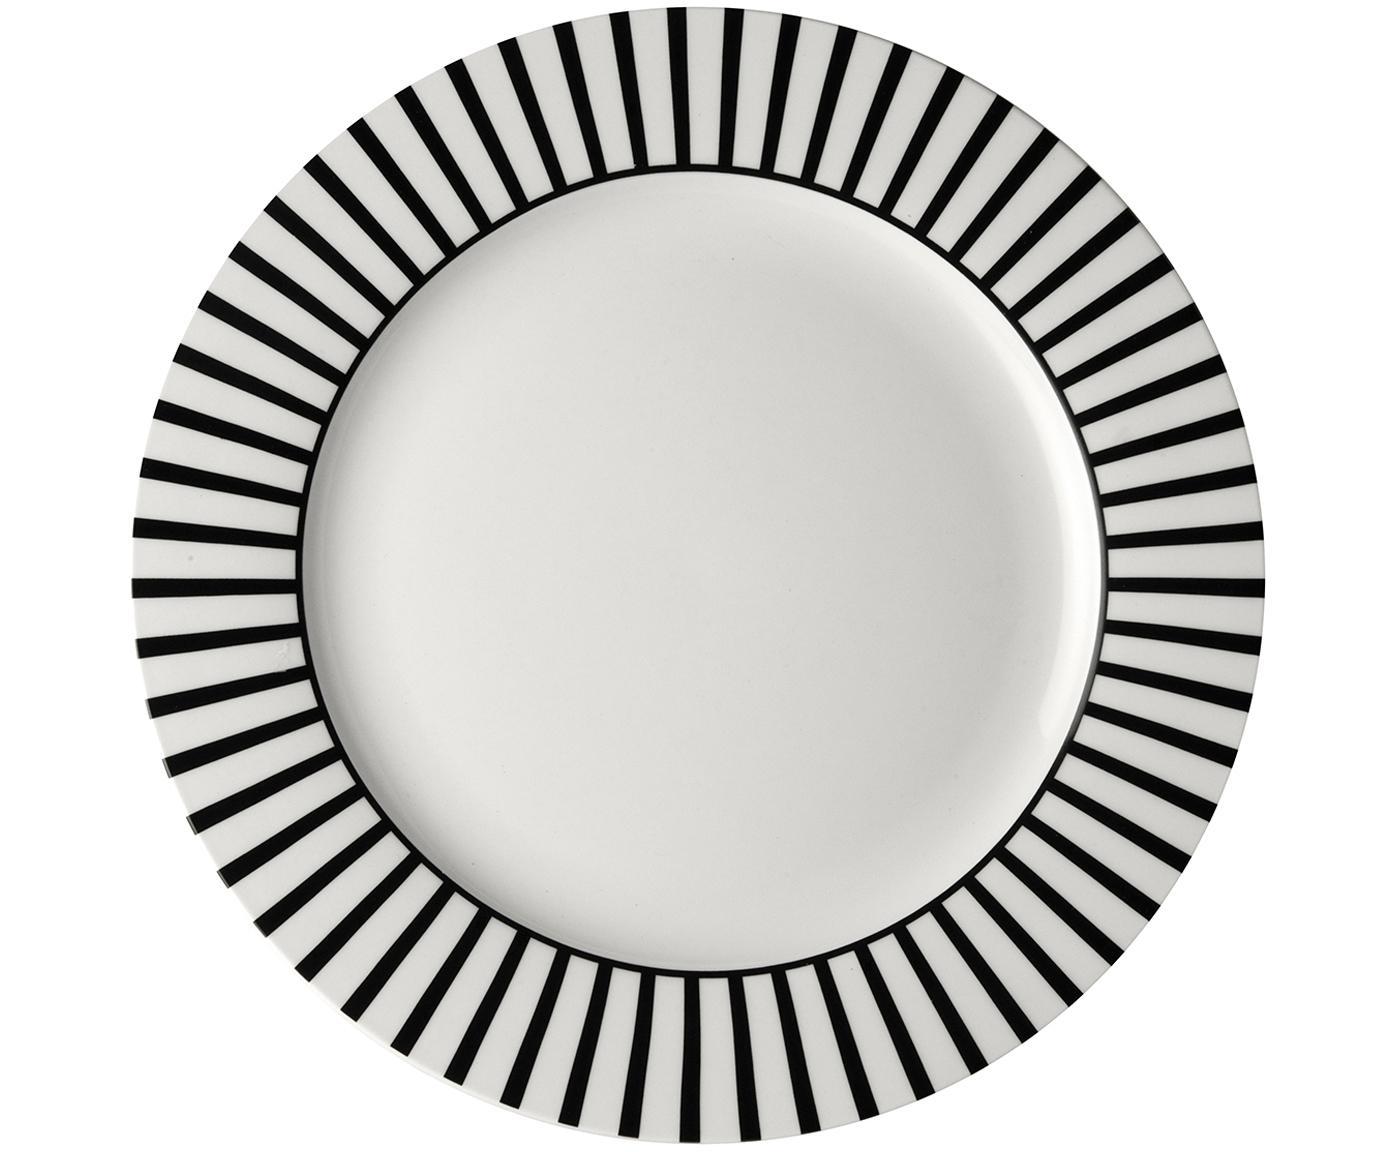 Platzteller Ceres Loft, 4 Stück, Porzellan, Weiß, Schwarz, Ø 30 x H 2 cm